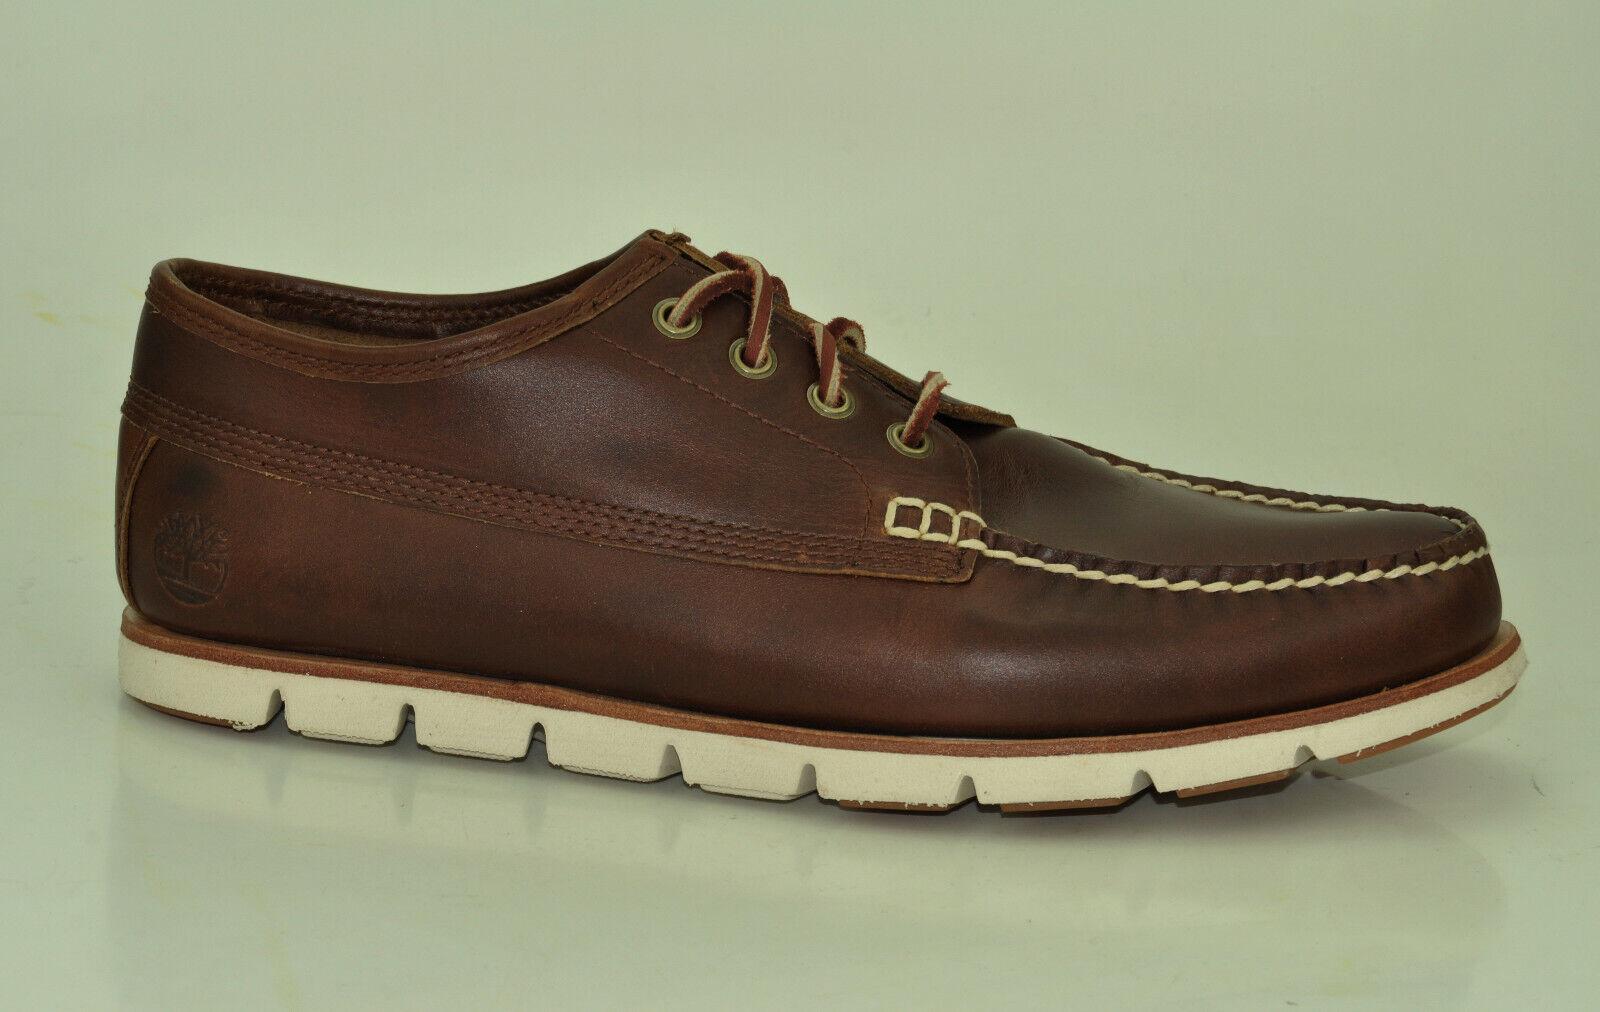 Timberland Tidelands 4-Eye Ranger Size 45 US 11 Lace Up Men Shoes A19XY